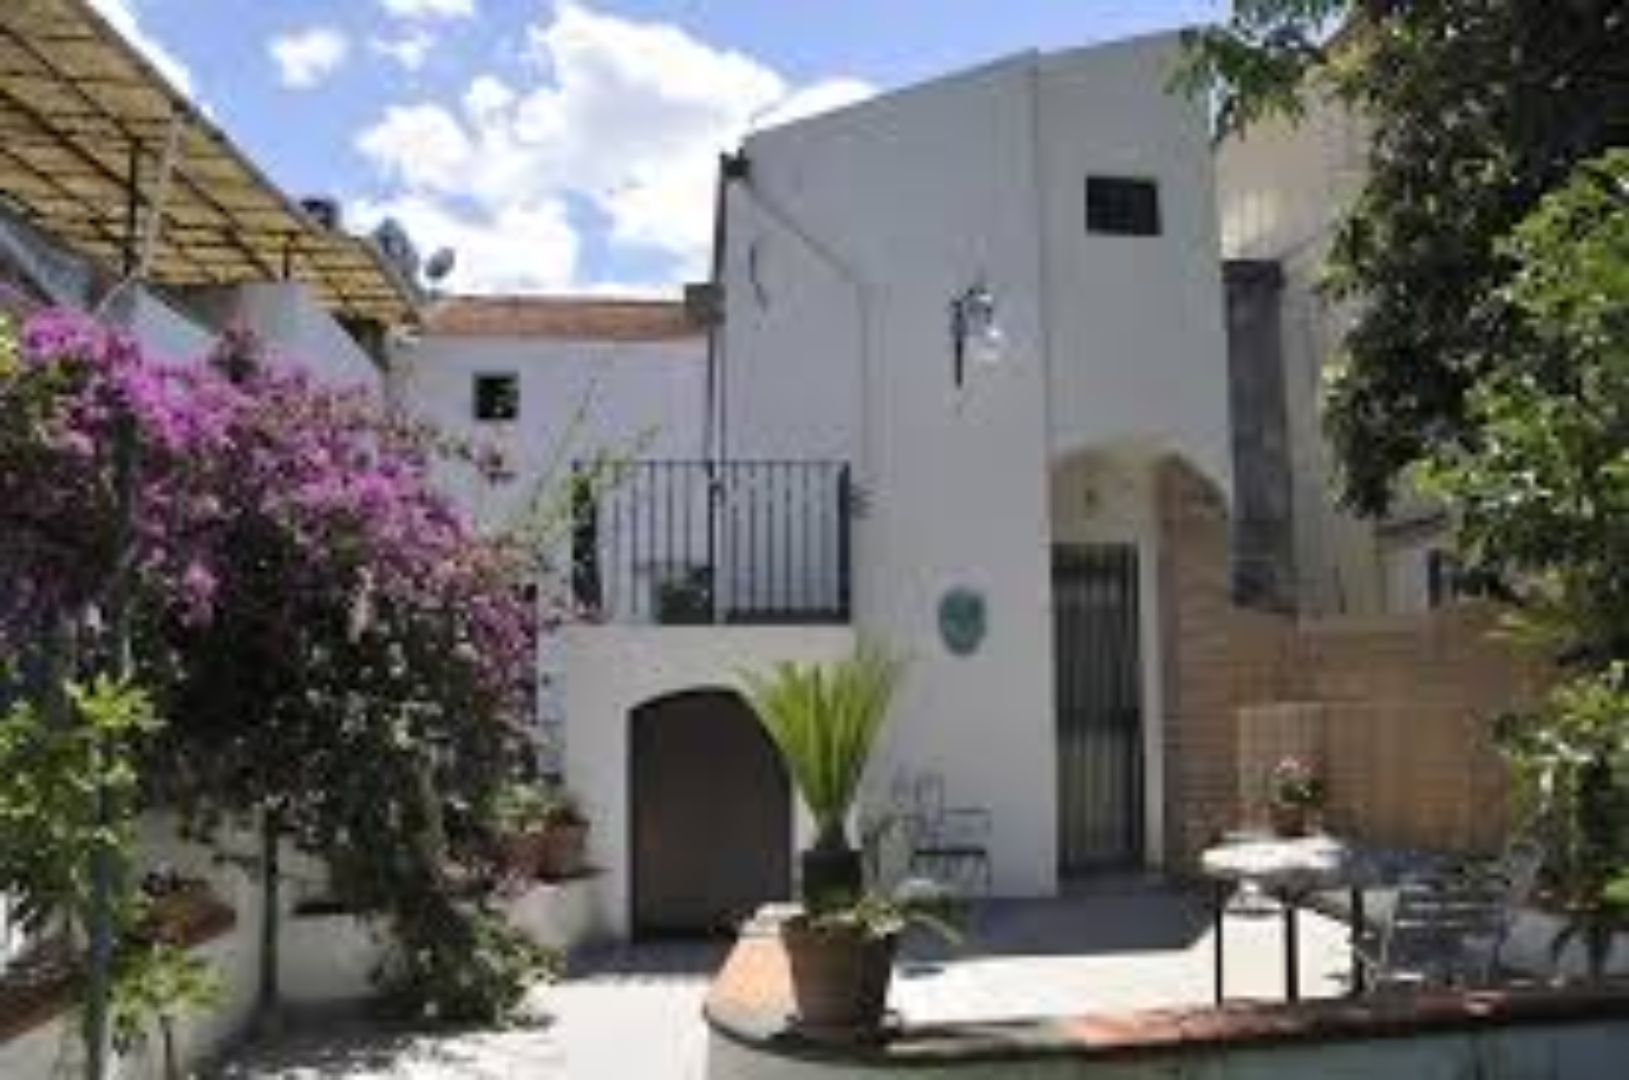 A view of a house at Casa Matron.